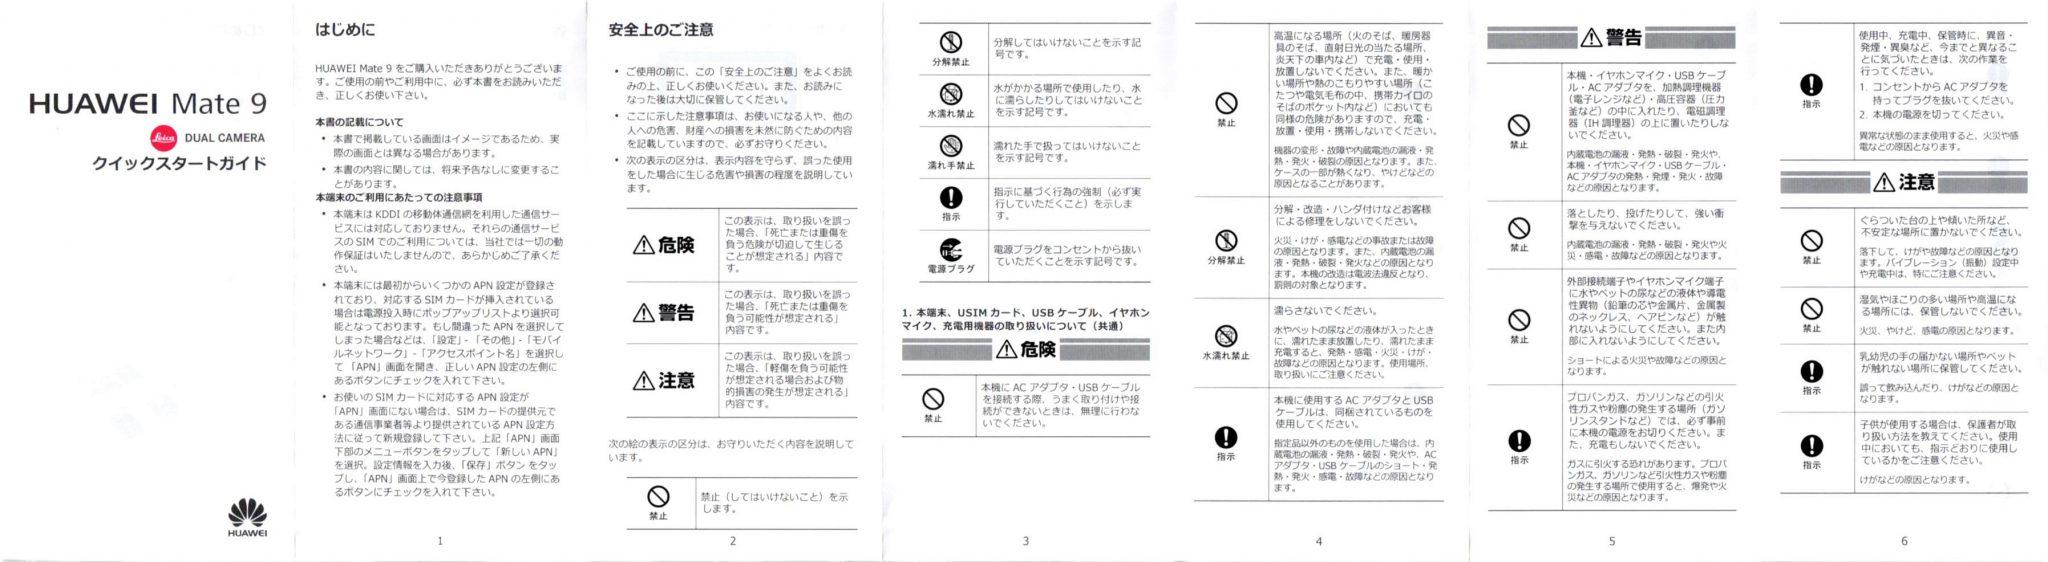 Huawei mate 9 付属品 取説 日本語1